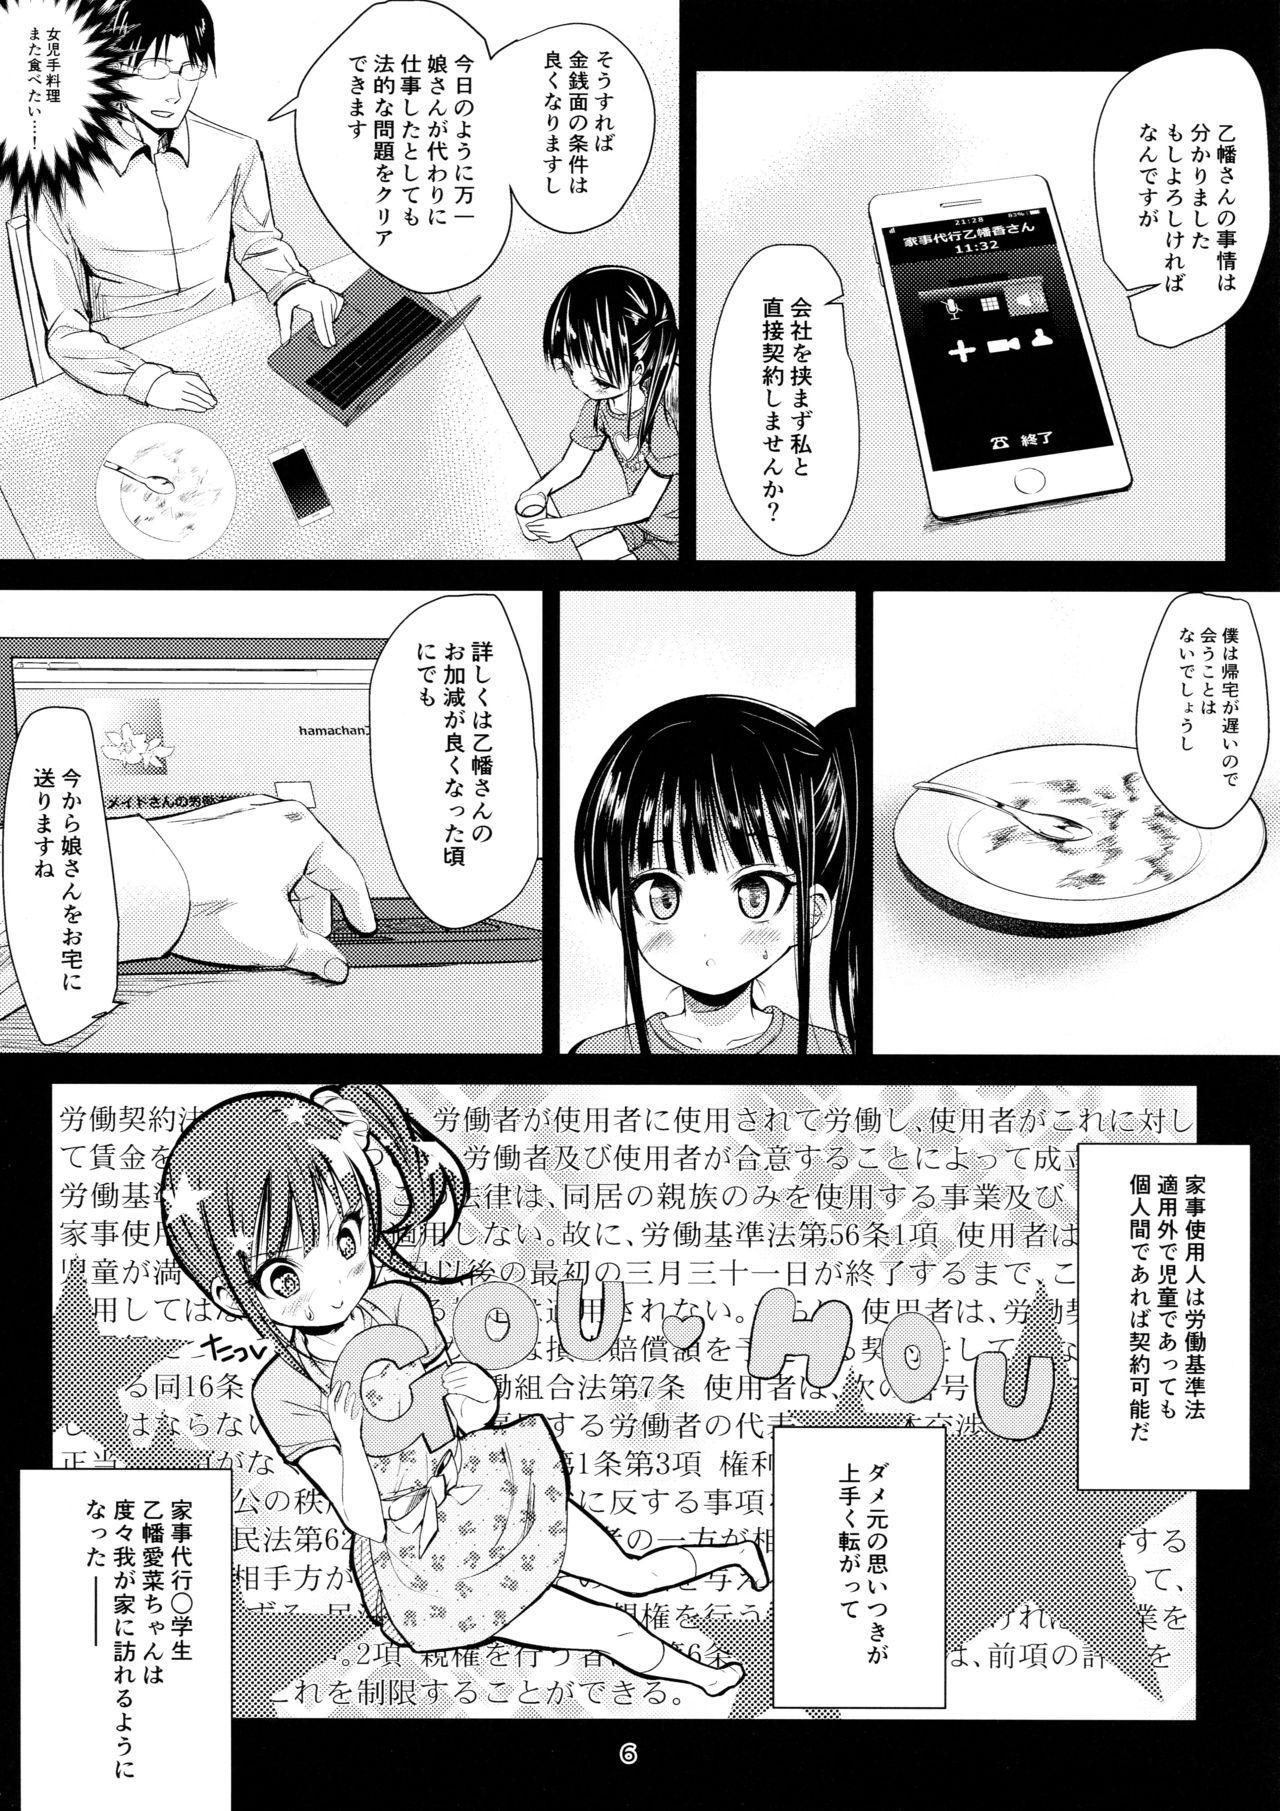 (C91) [Bizensiki Roroppu (Bizen)] JS Kaji Daikou (Gouhou) de Ecchigurashi 5